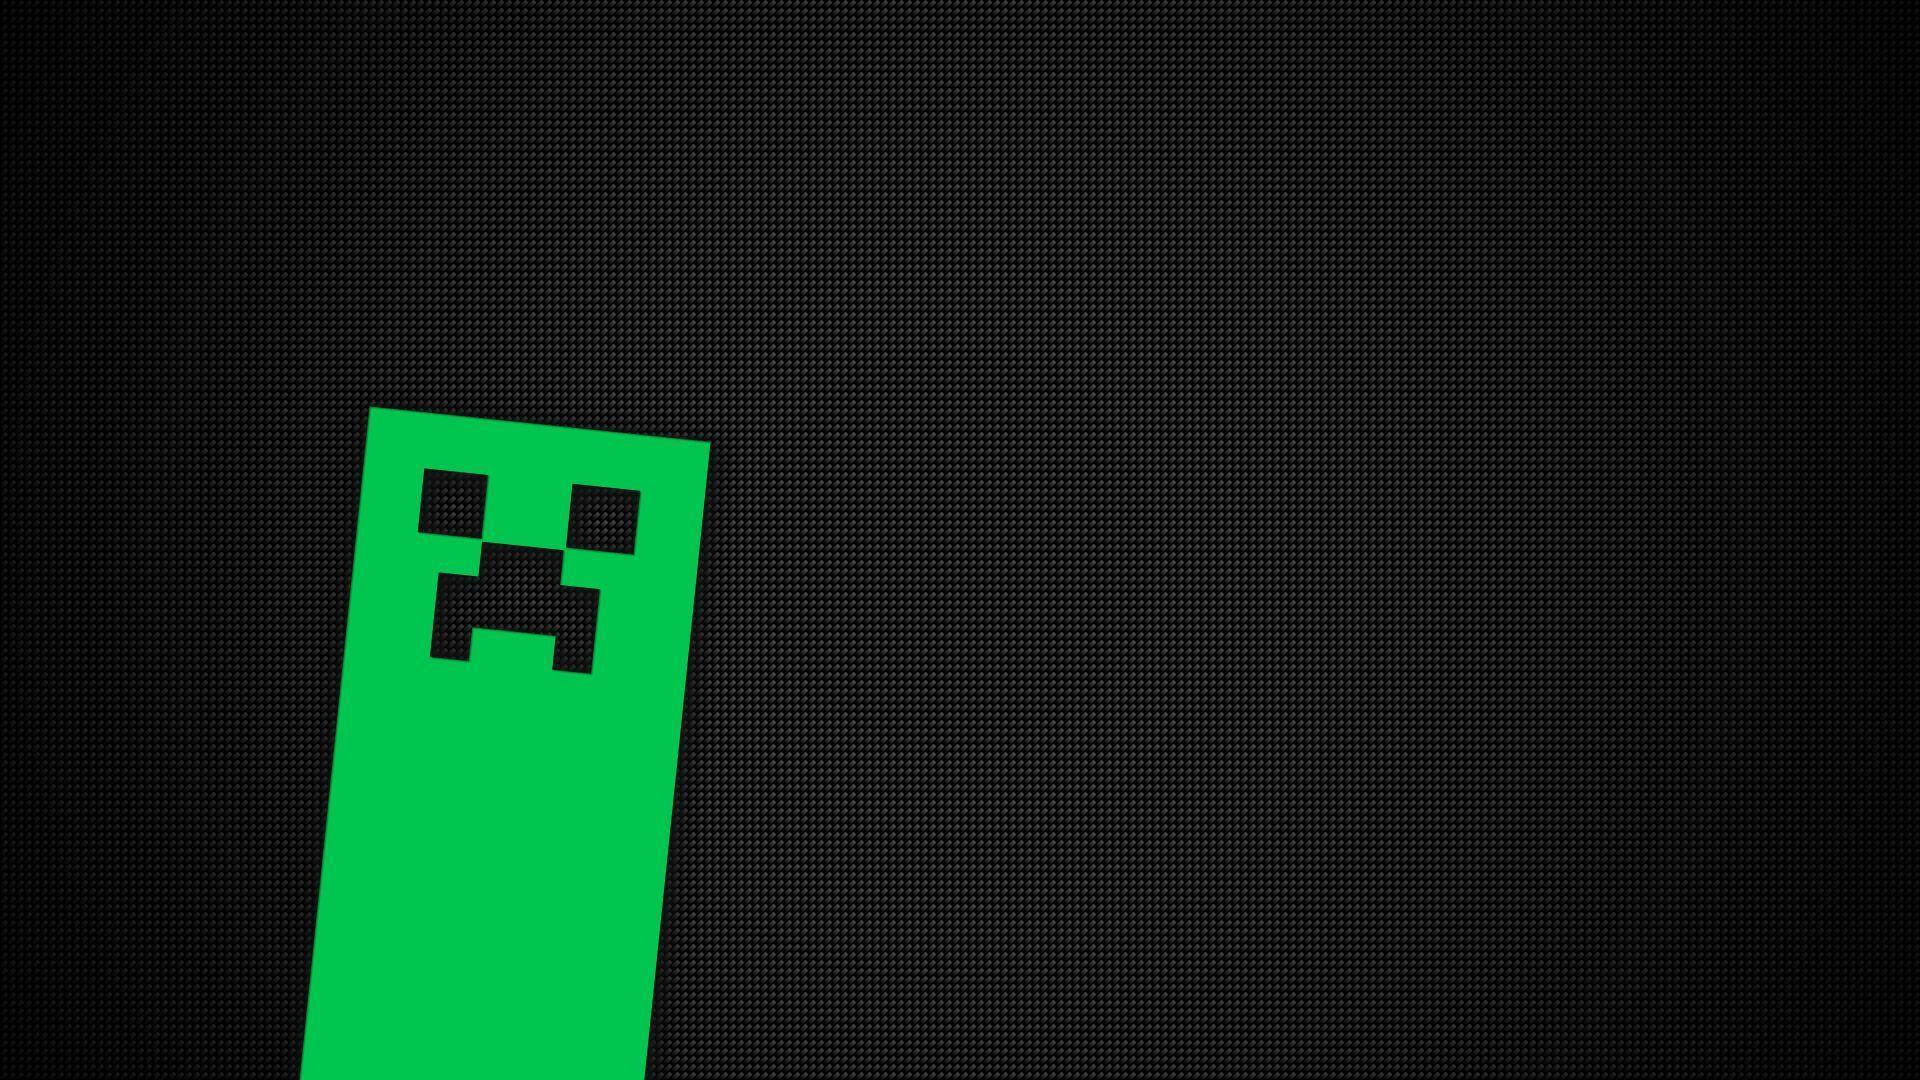 Creeper Wallpaper Hd Creeper Face In Minecraft Hd Desktop Wallpaper